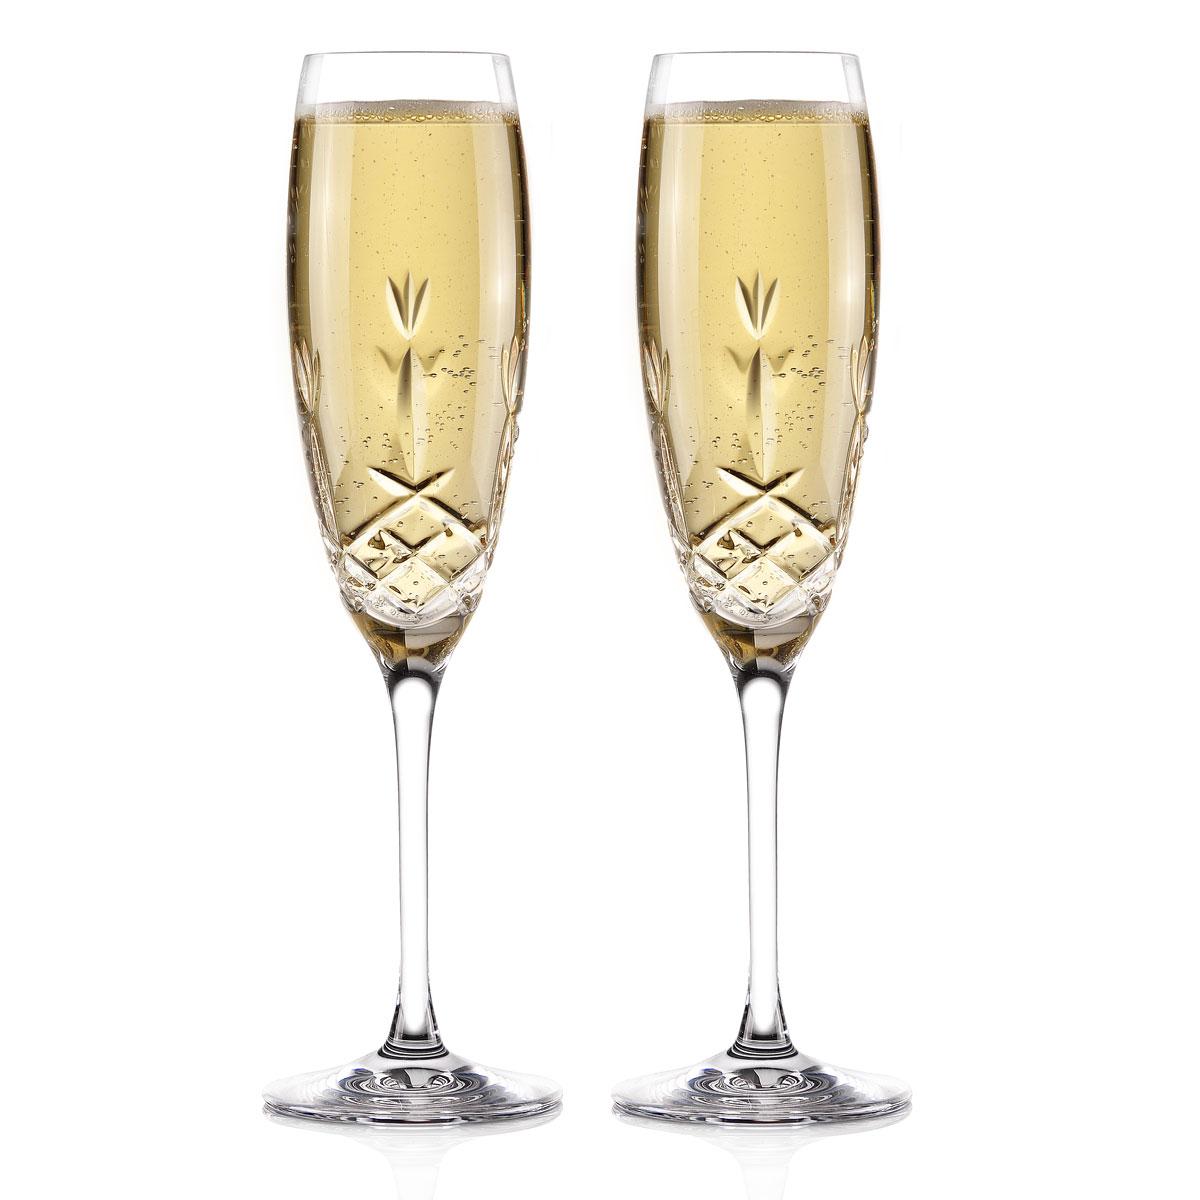 Cashs Ireland Hawthorne Fairy Champagne Toasting Flutes, Pair